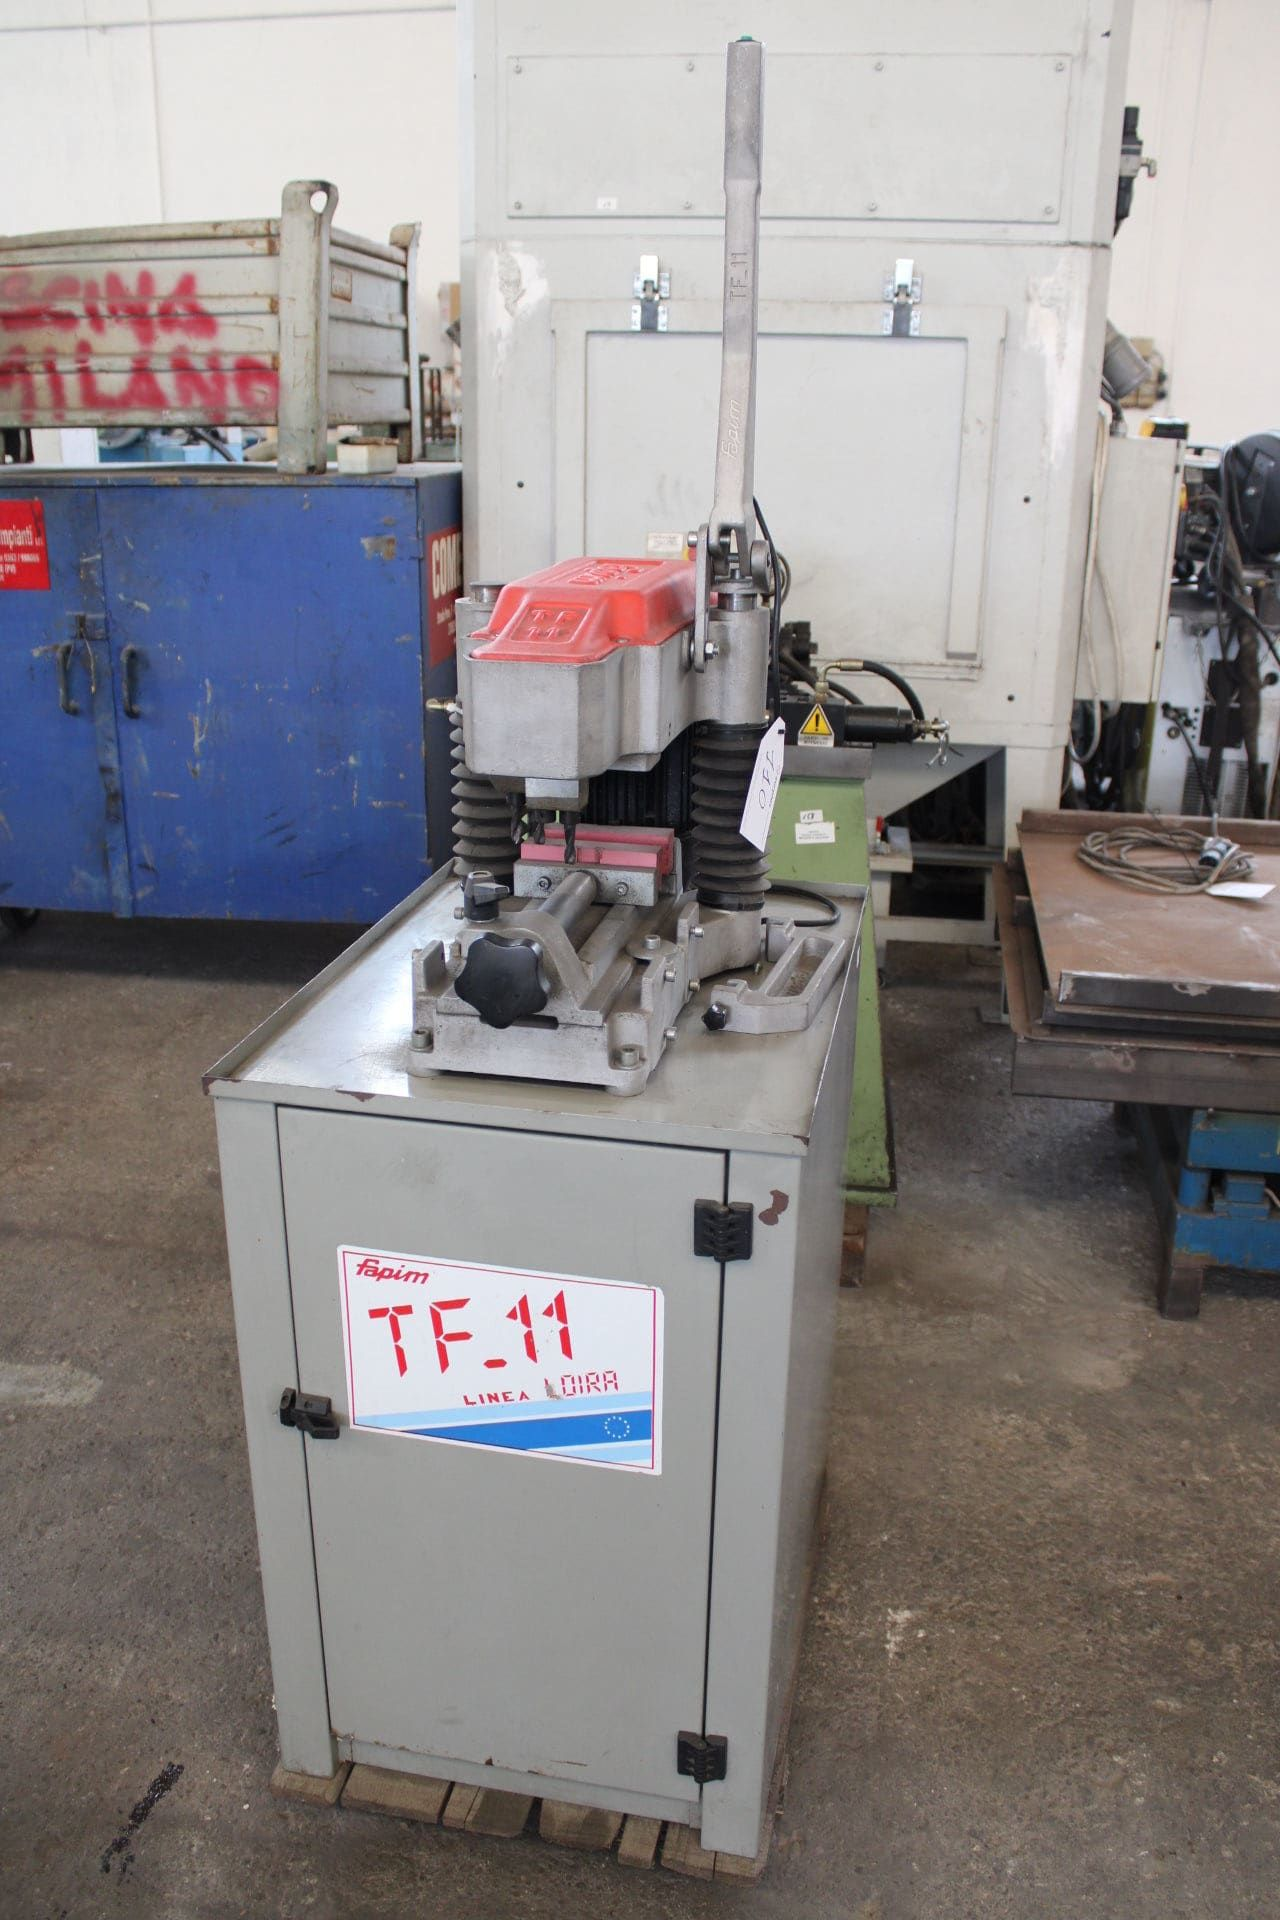 FAPIM TF11 Bohrmaschine